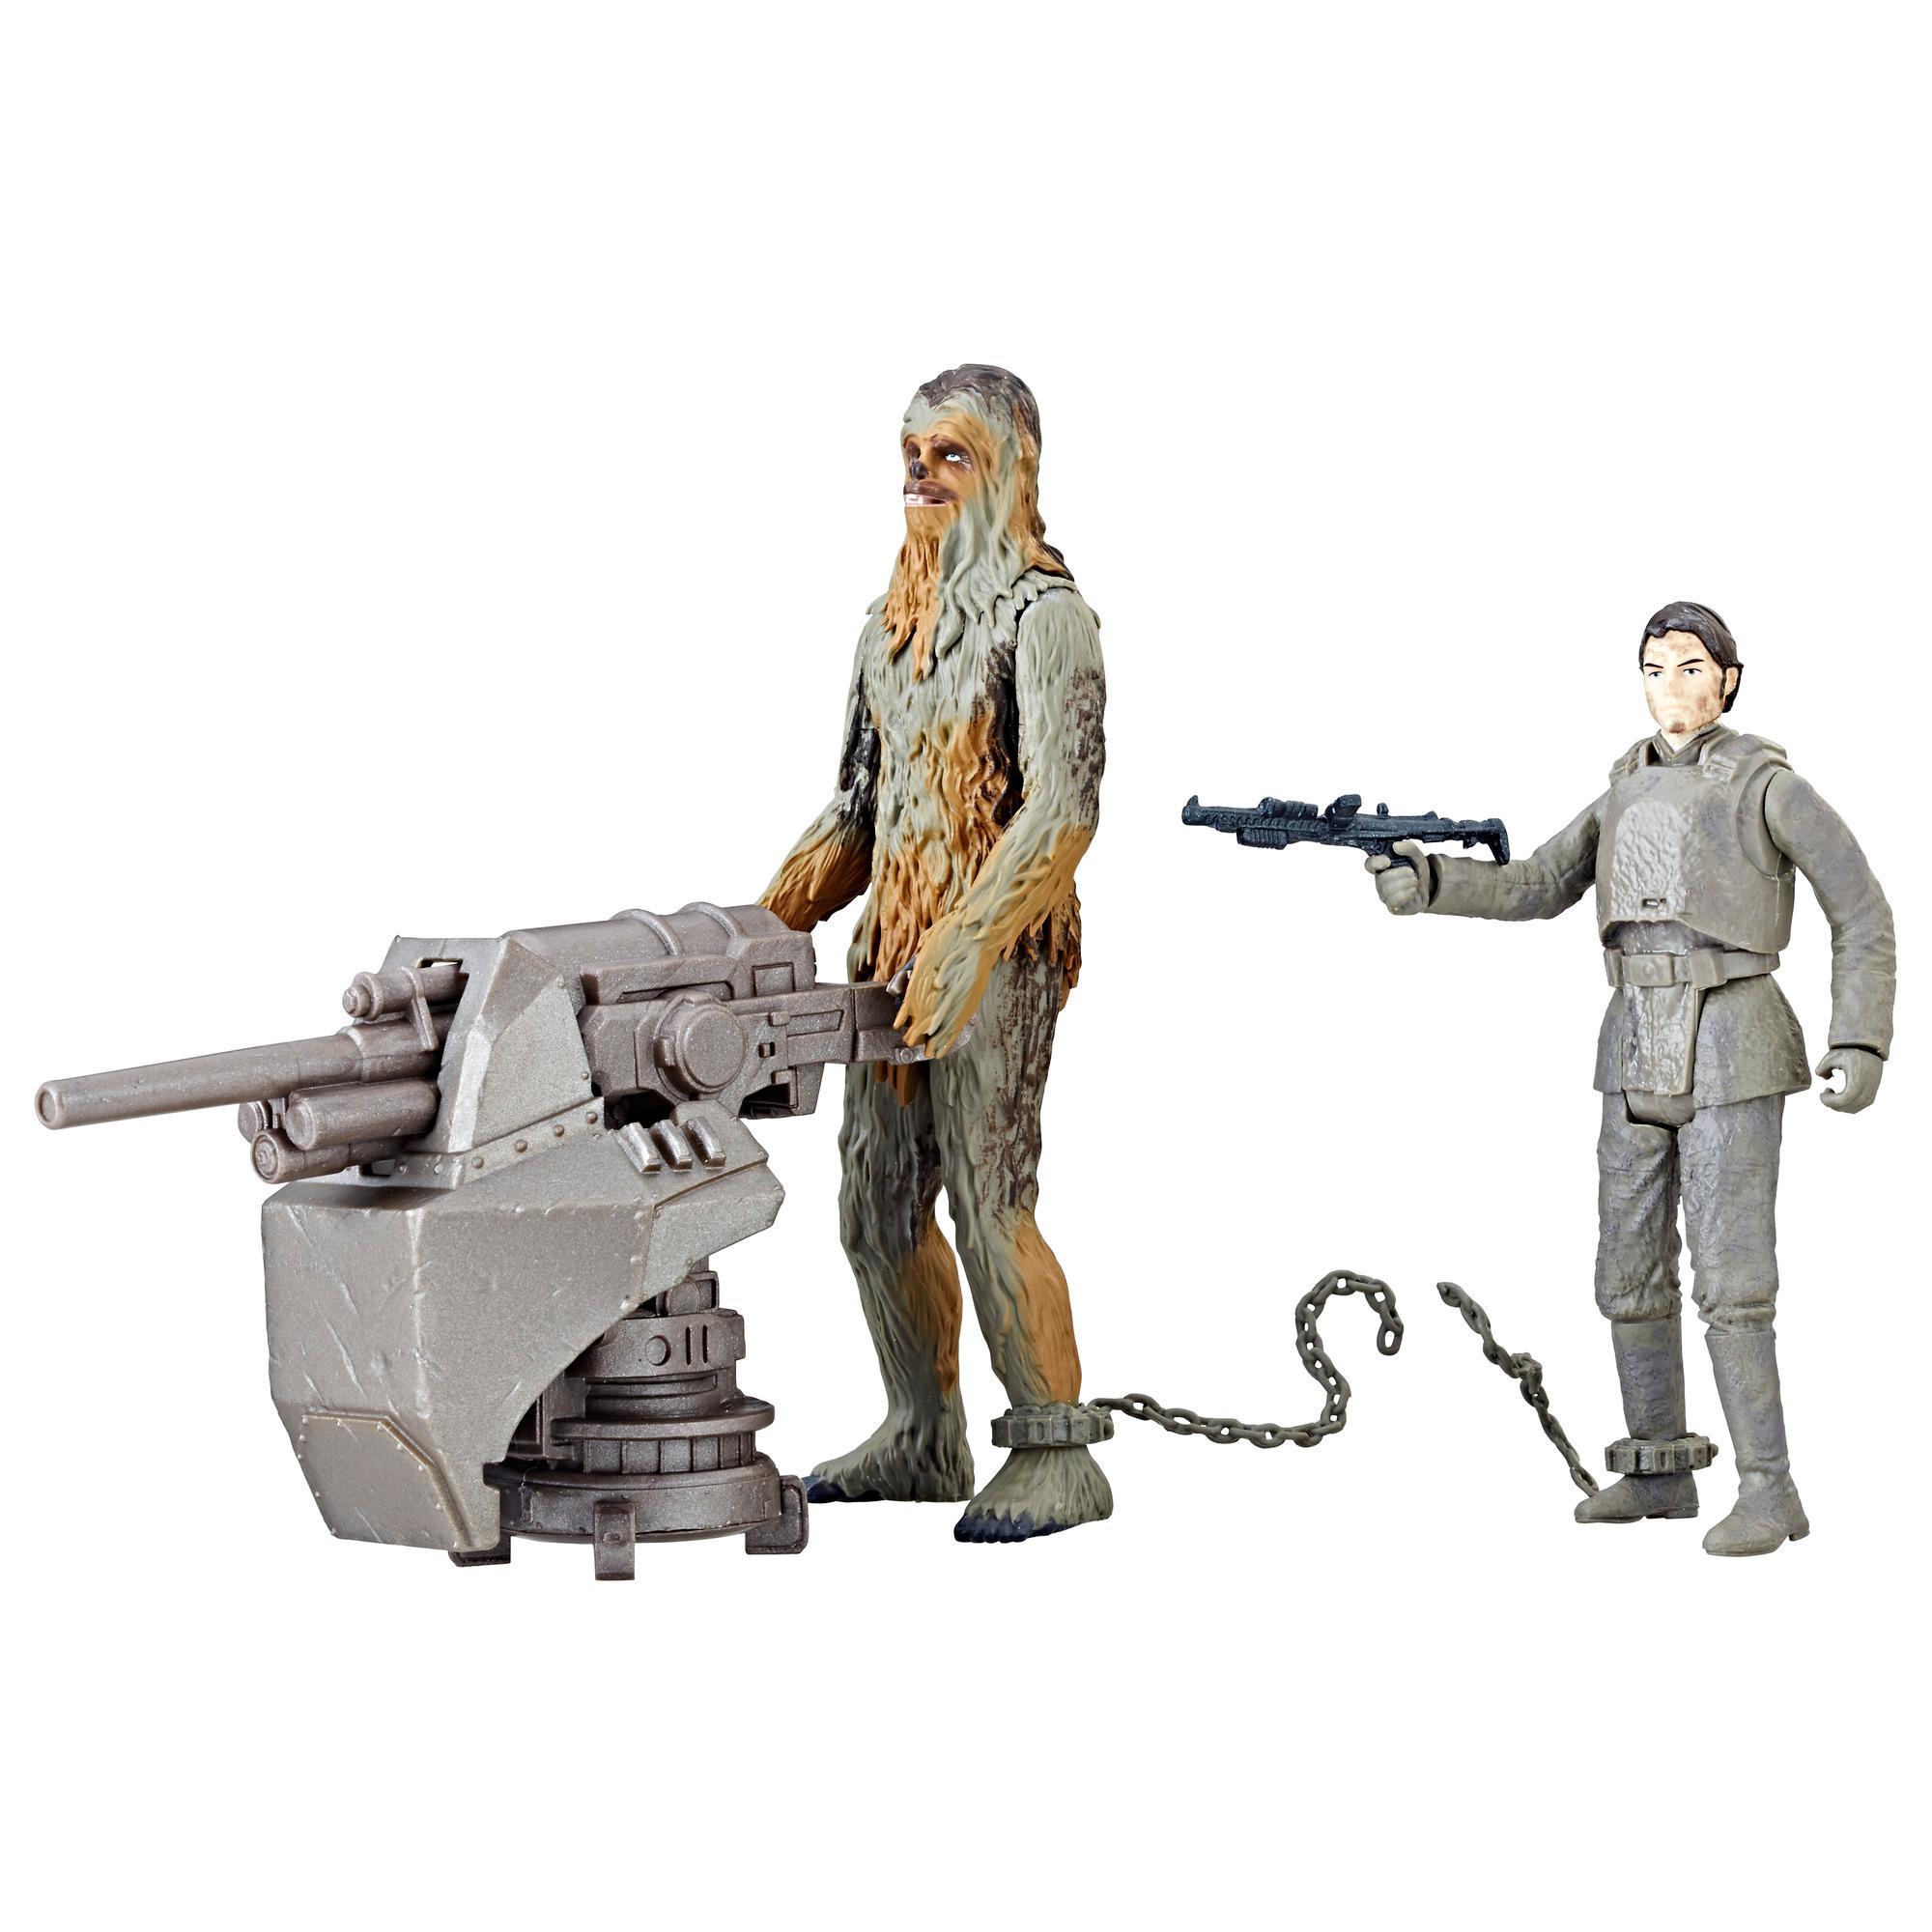 Star Wars Force Link 2.0 - Empaque doble con figuras de Han Solo (Mimban) y Chewbacca (Mimban)